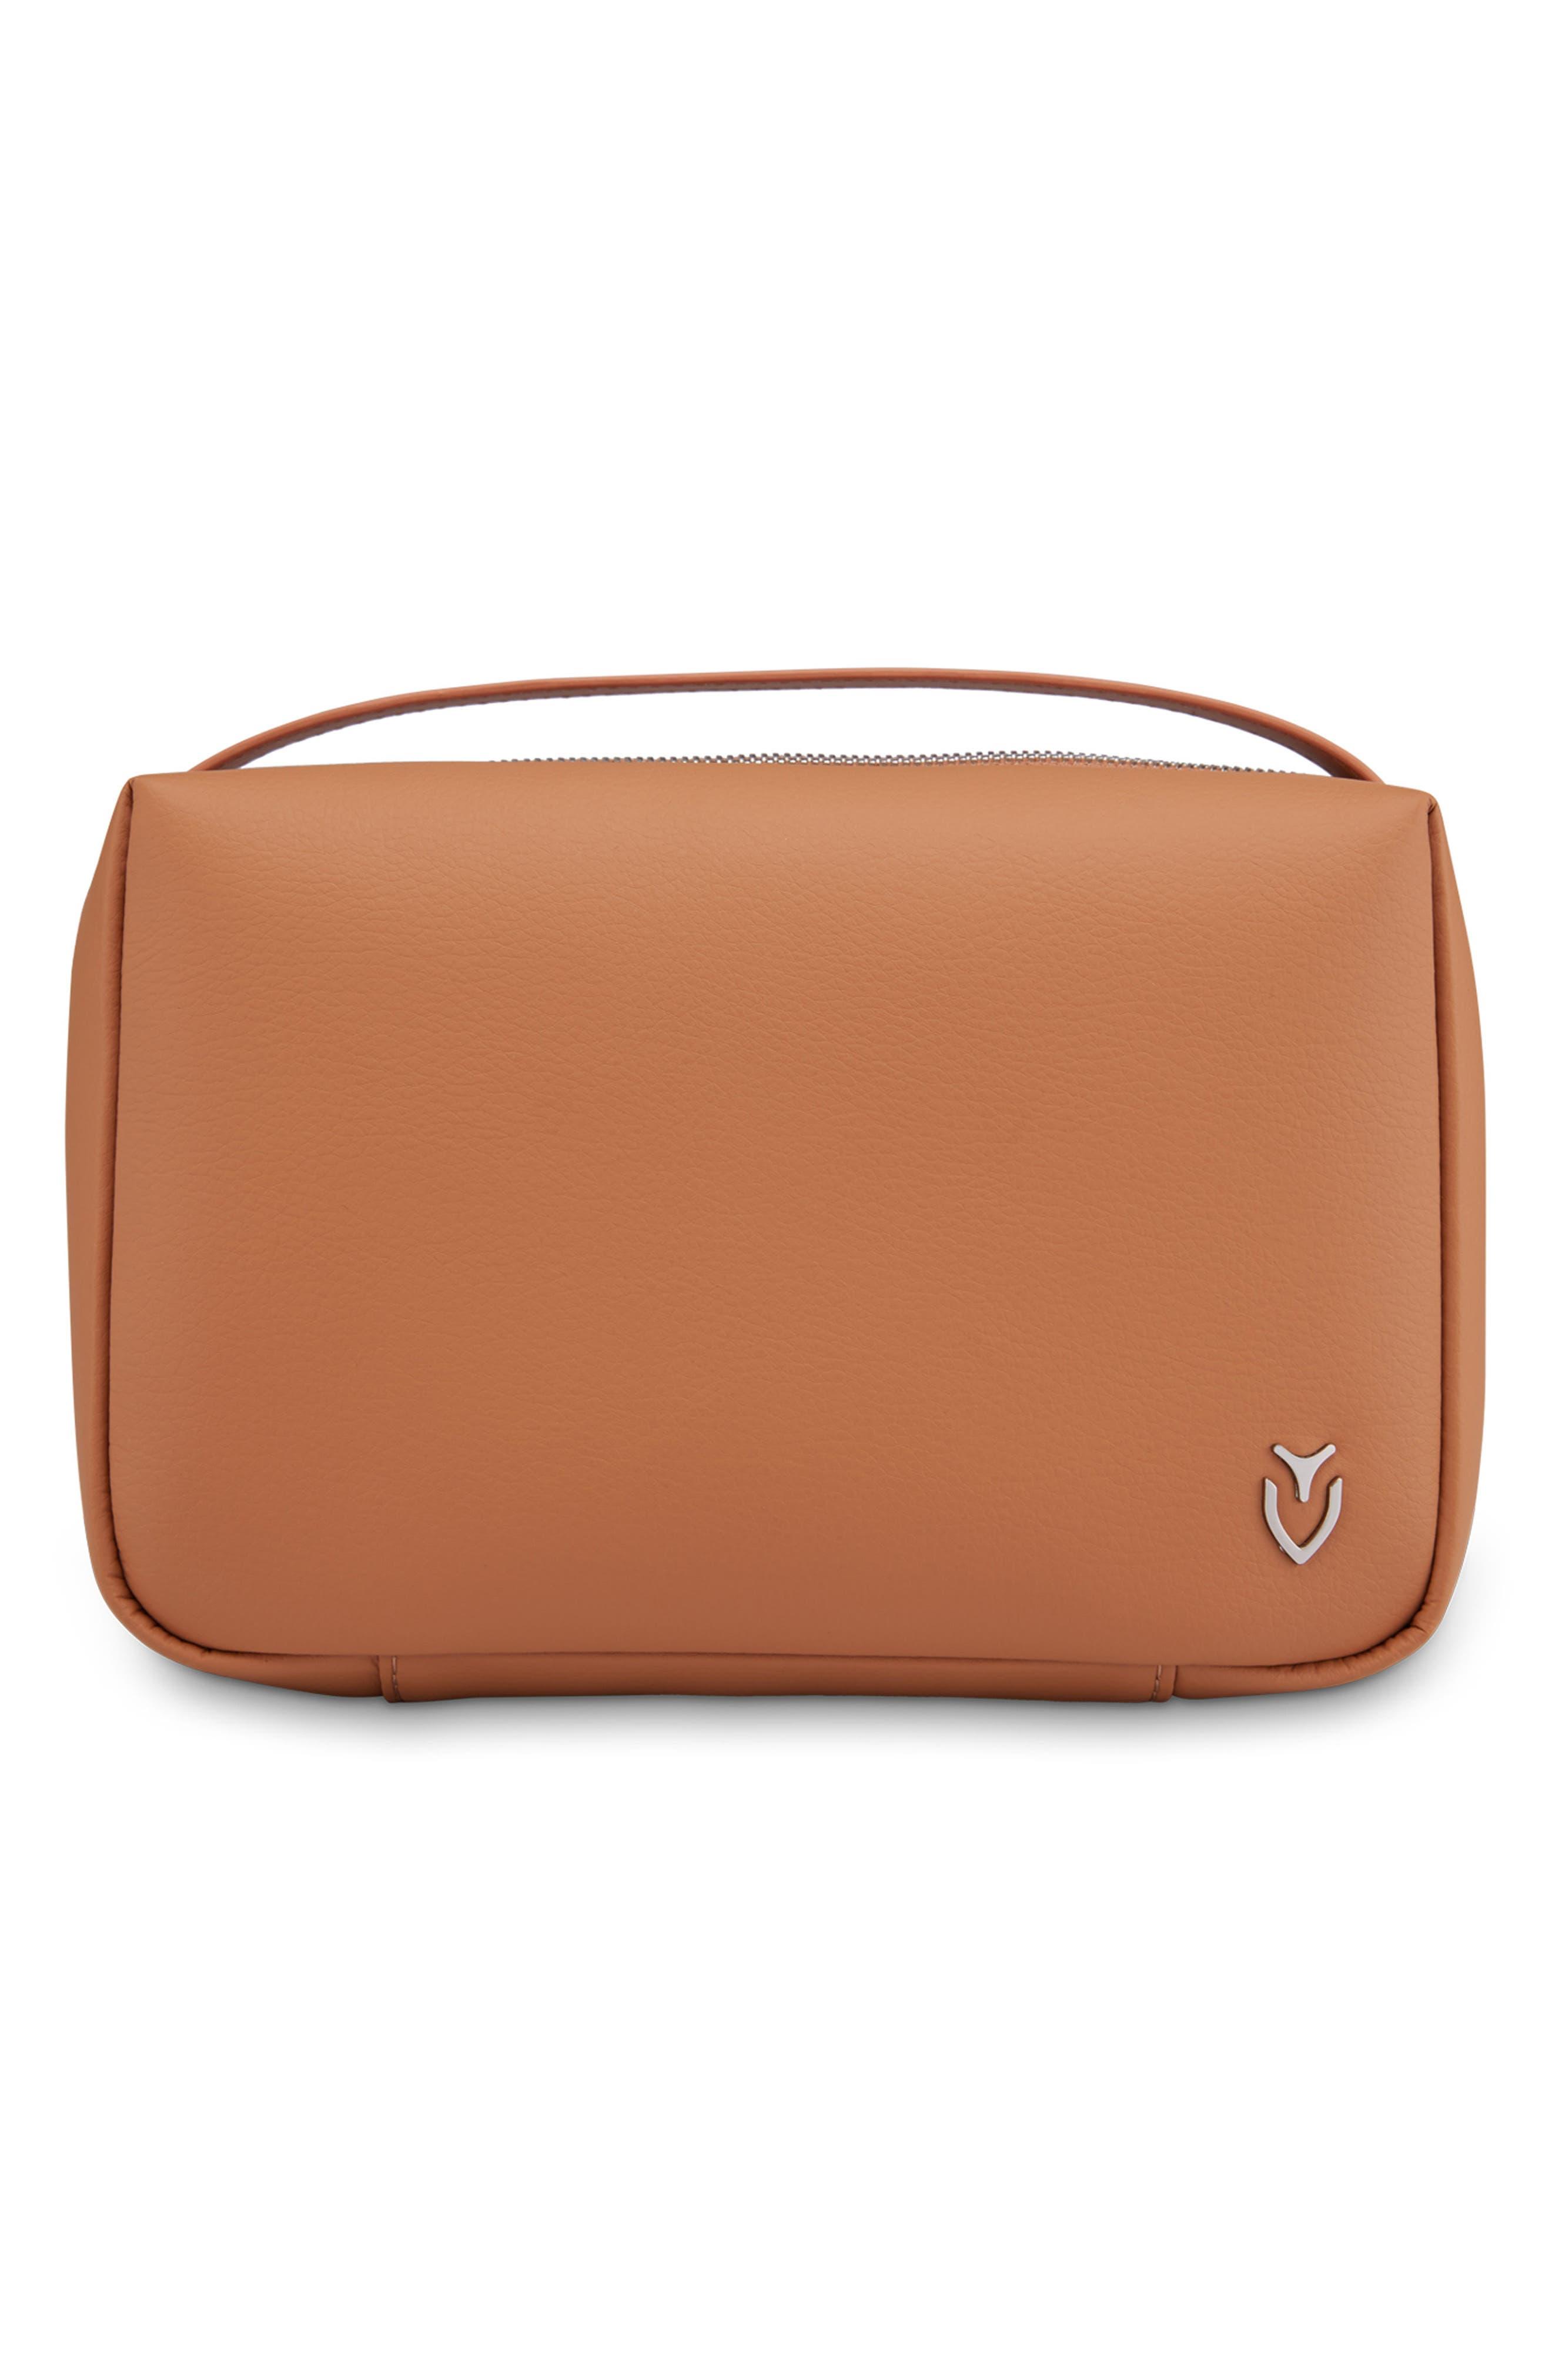 Main Image - Vessel Signature 2.0 Faux Leather Toiletry Case